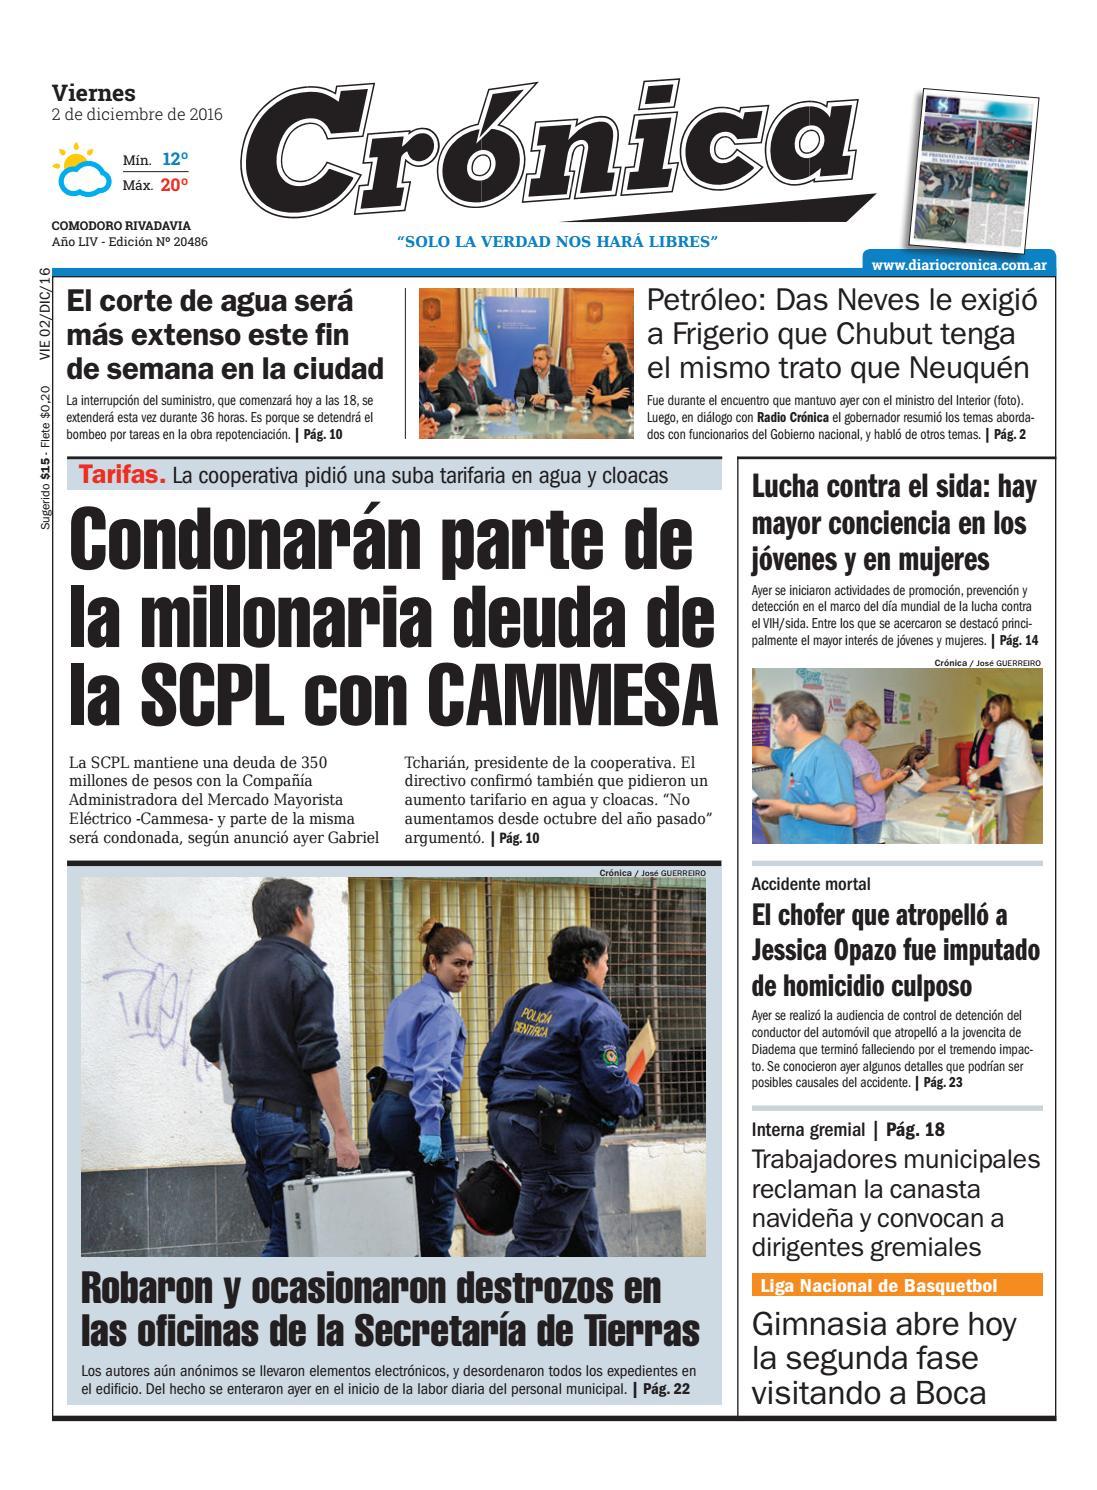 845d9cf635f0666f7b735d086181e543 by Diario Crónica - issuu